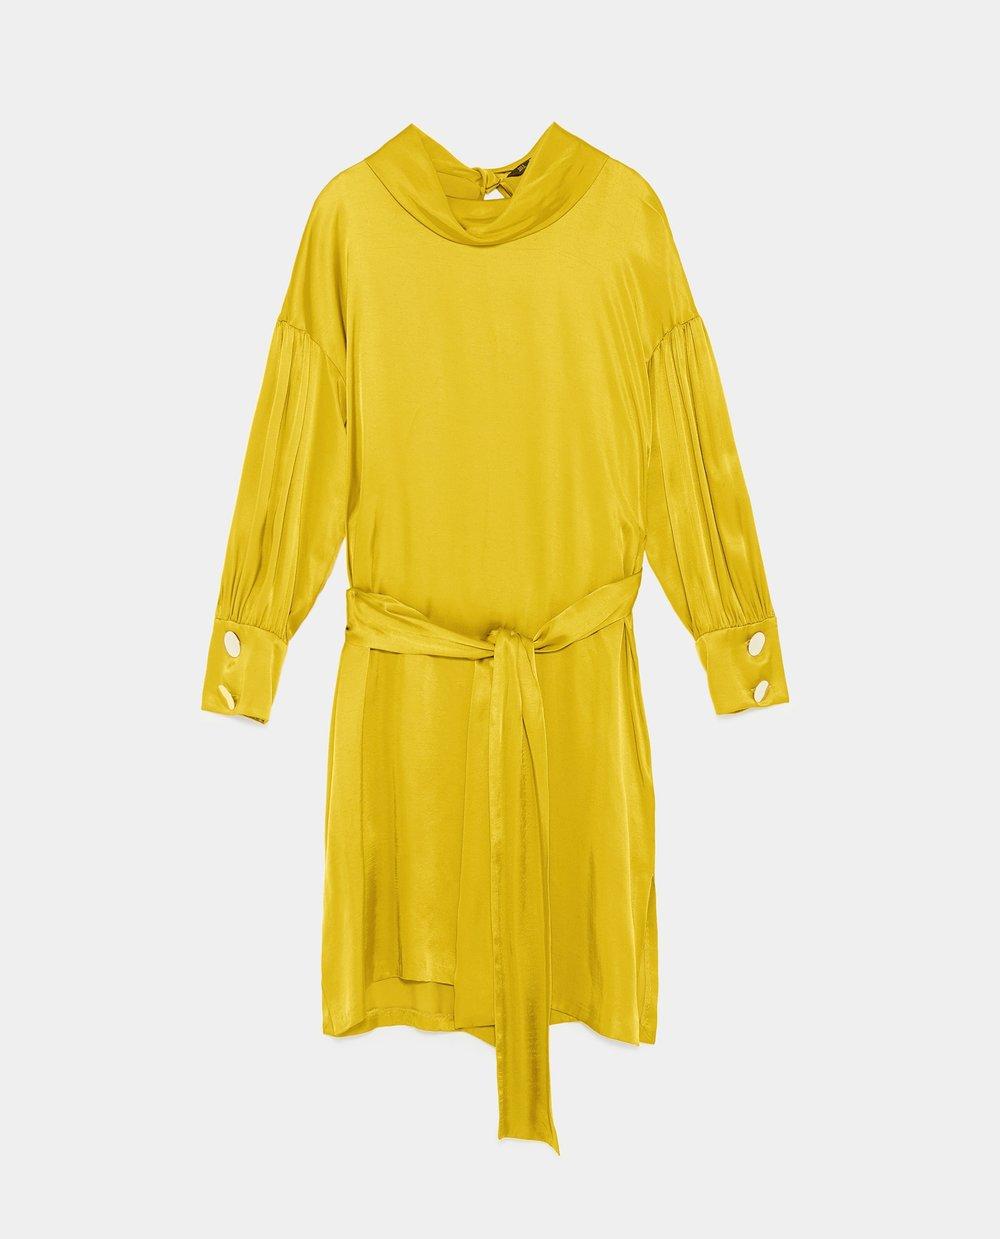 Dress, £39.99, Zara